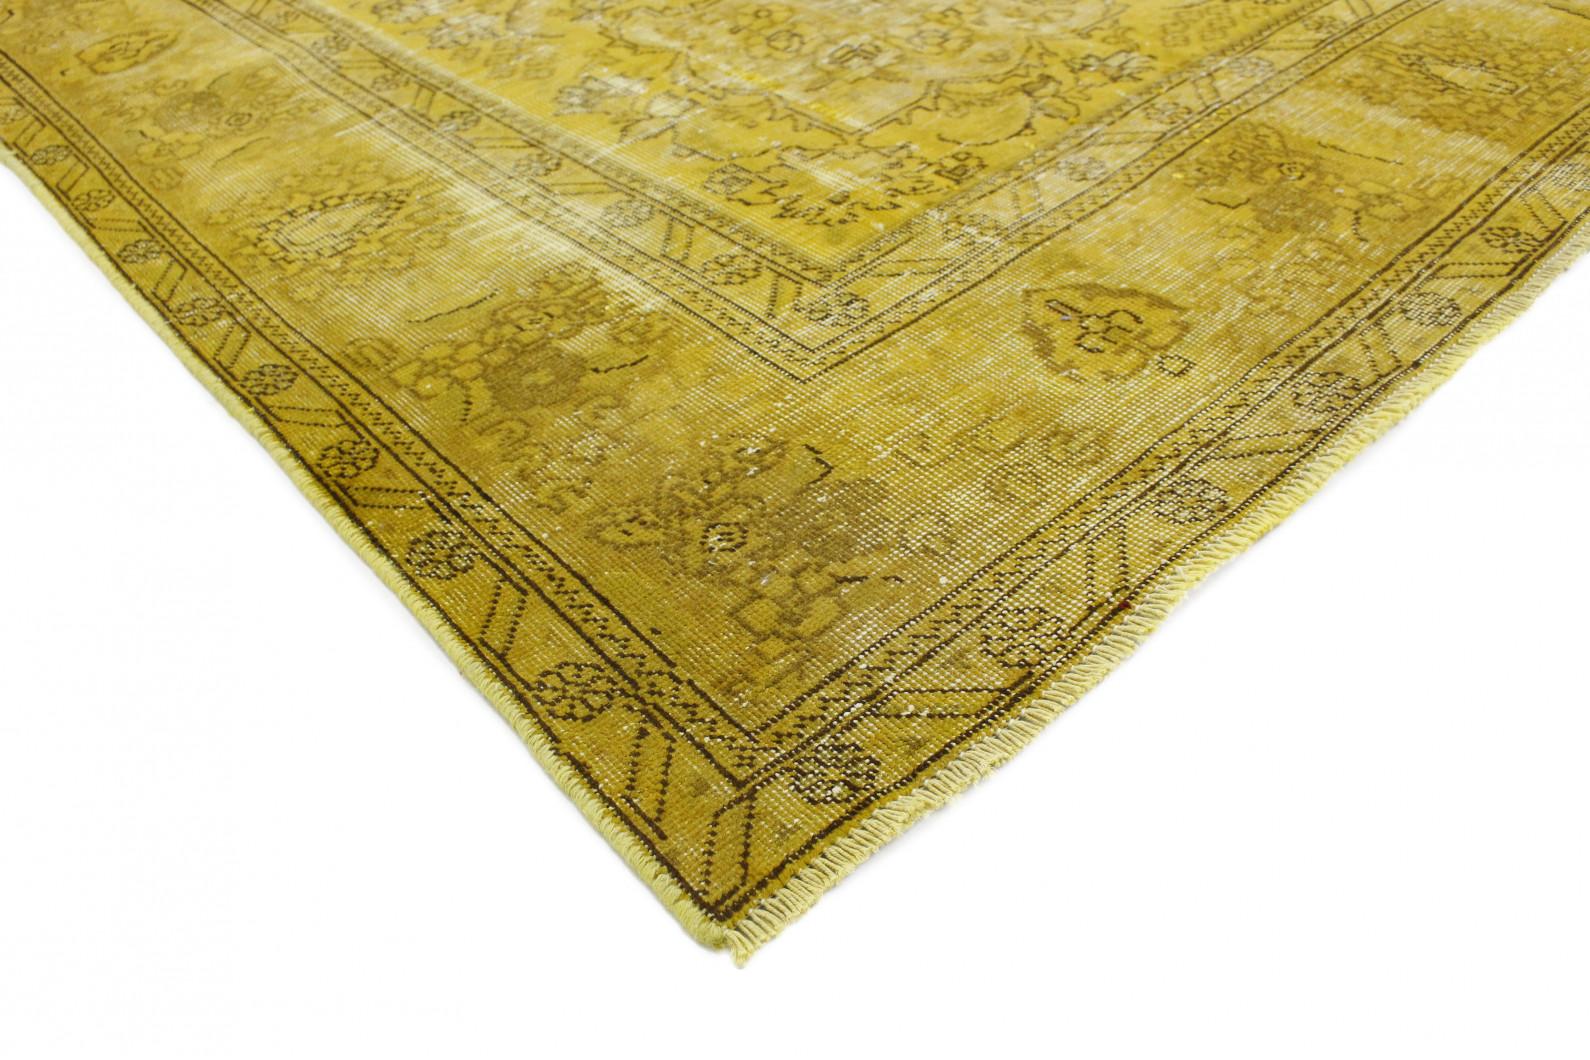 vintage teppich gelb gold in 390x280 1001 167180 bei. Black Bedroom Furniture Sets. Home Design Ideas